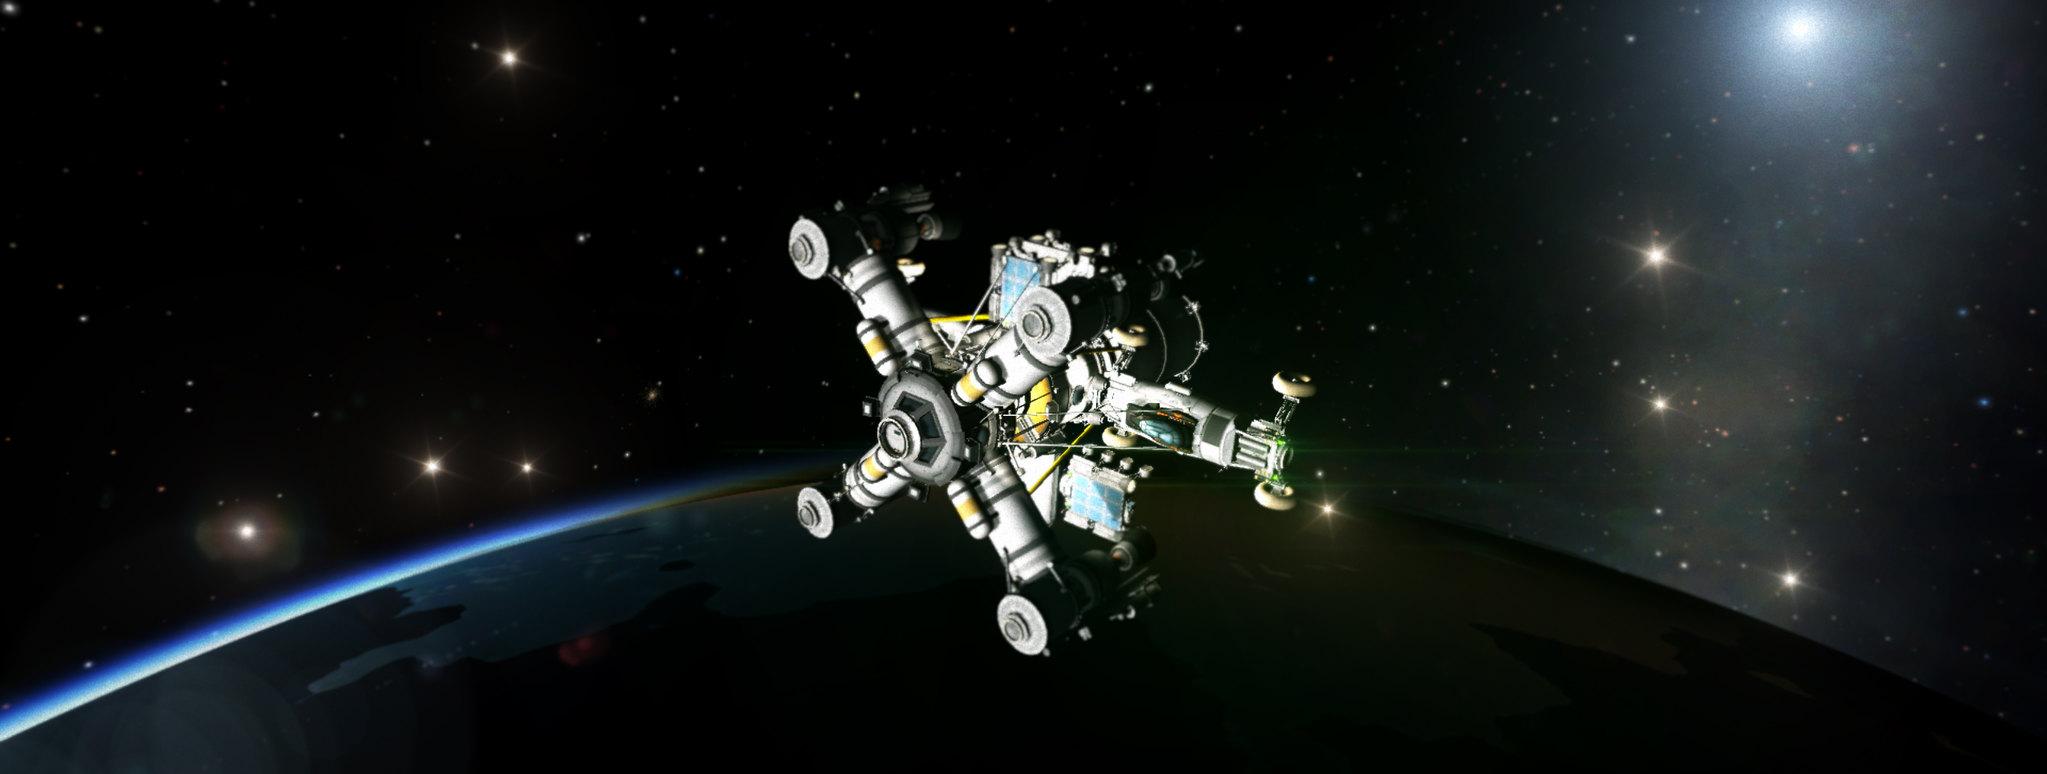 kerbal space program duna base - photo #8